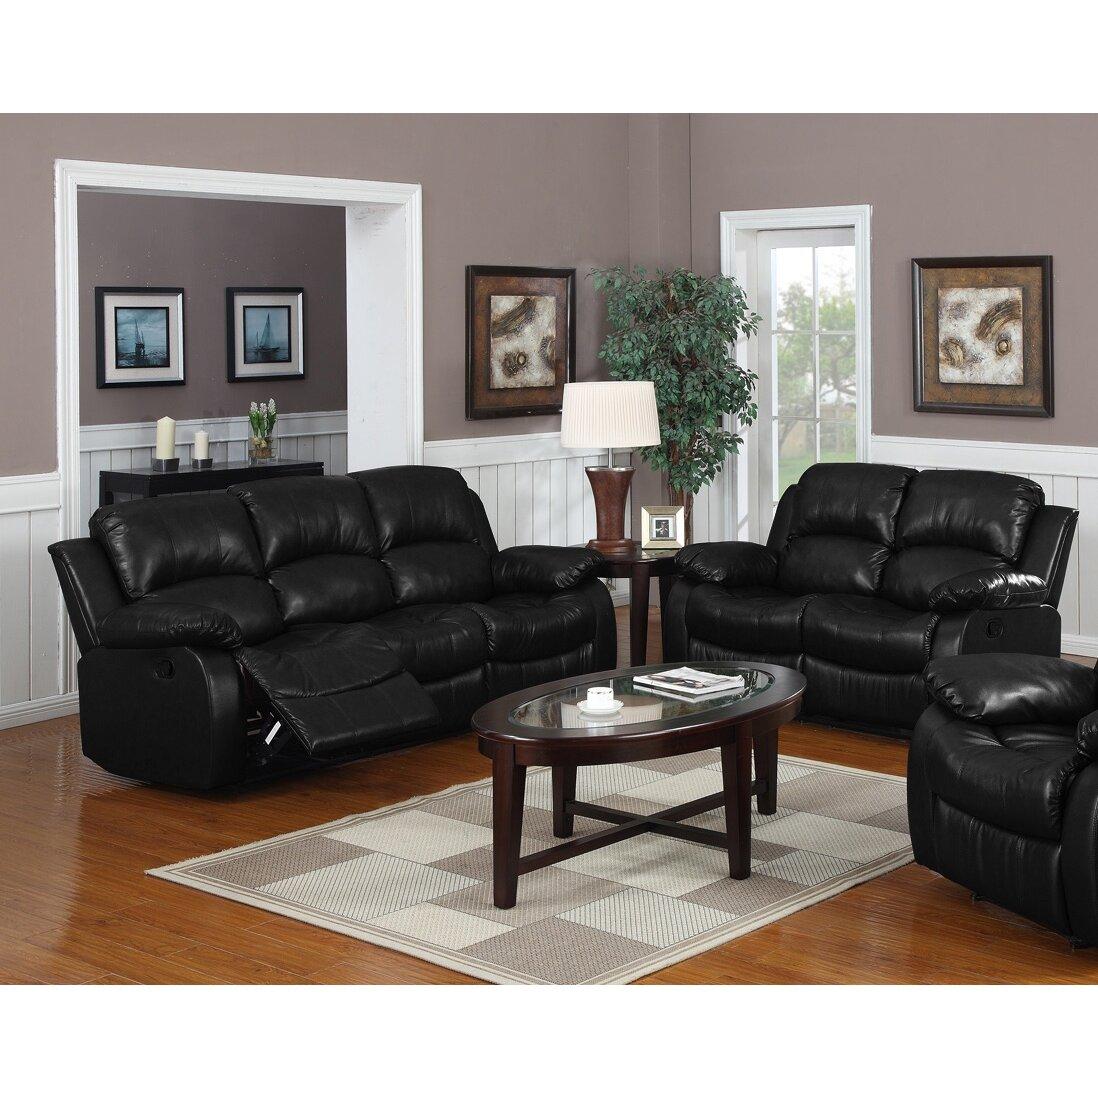 wildon home montclair 2 piece reclining living room set